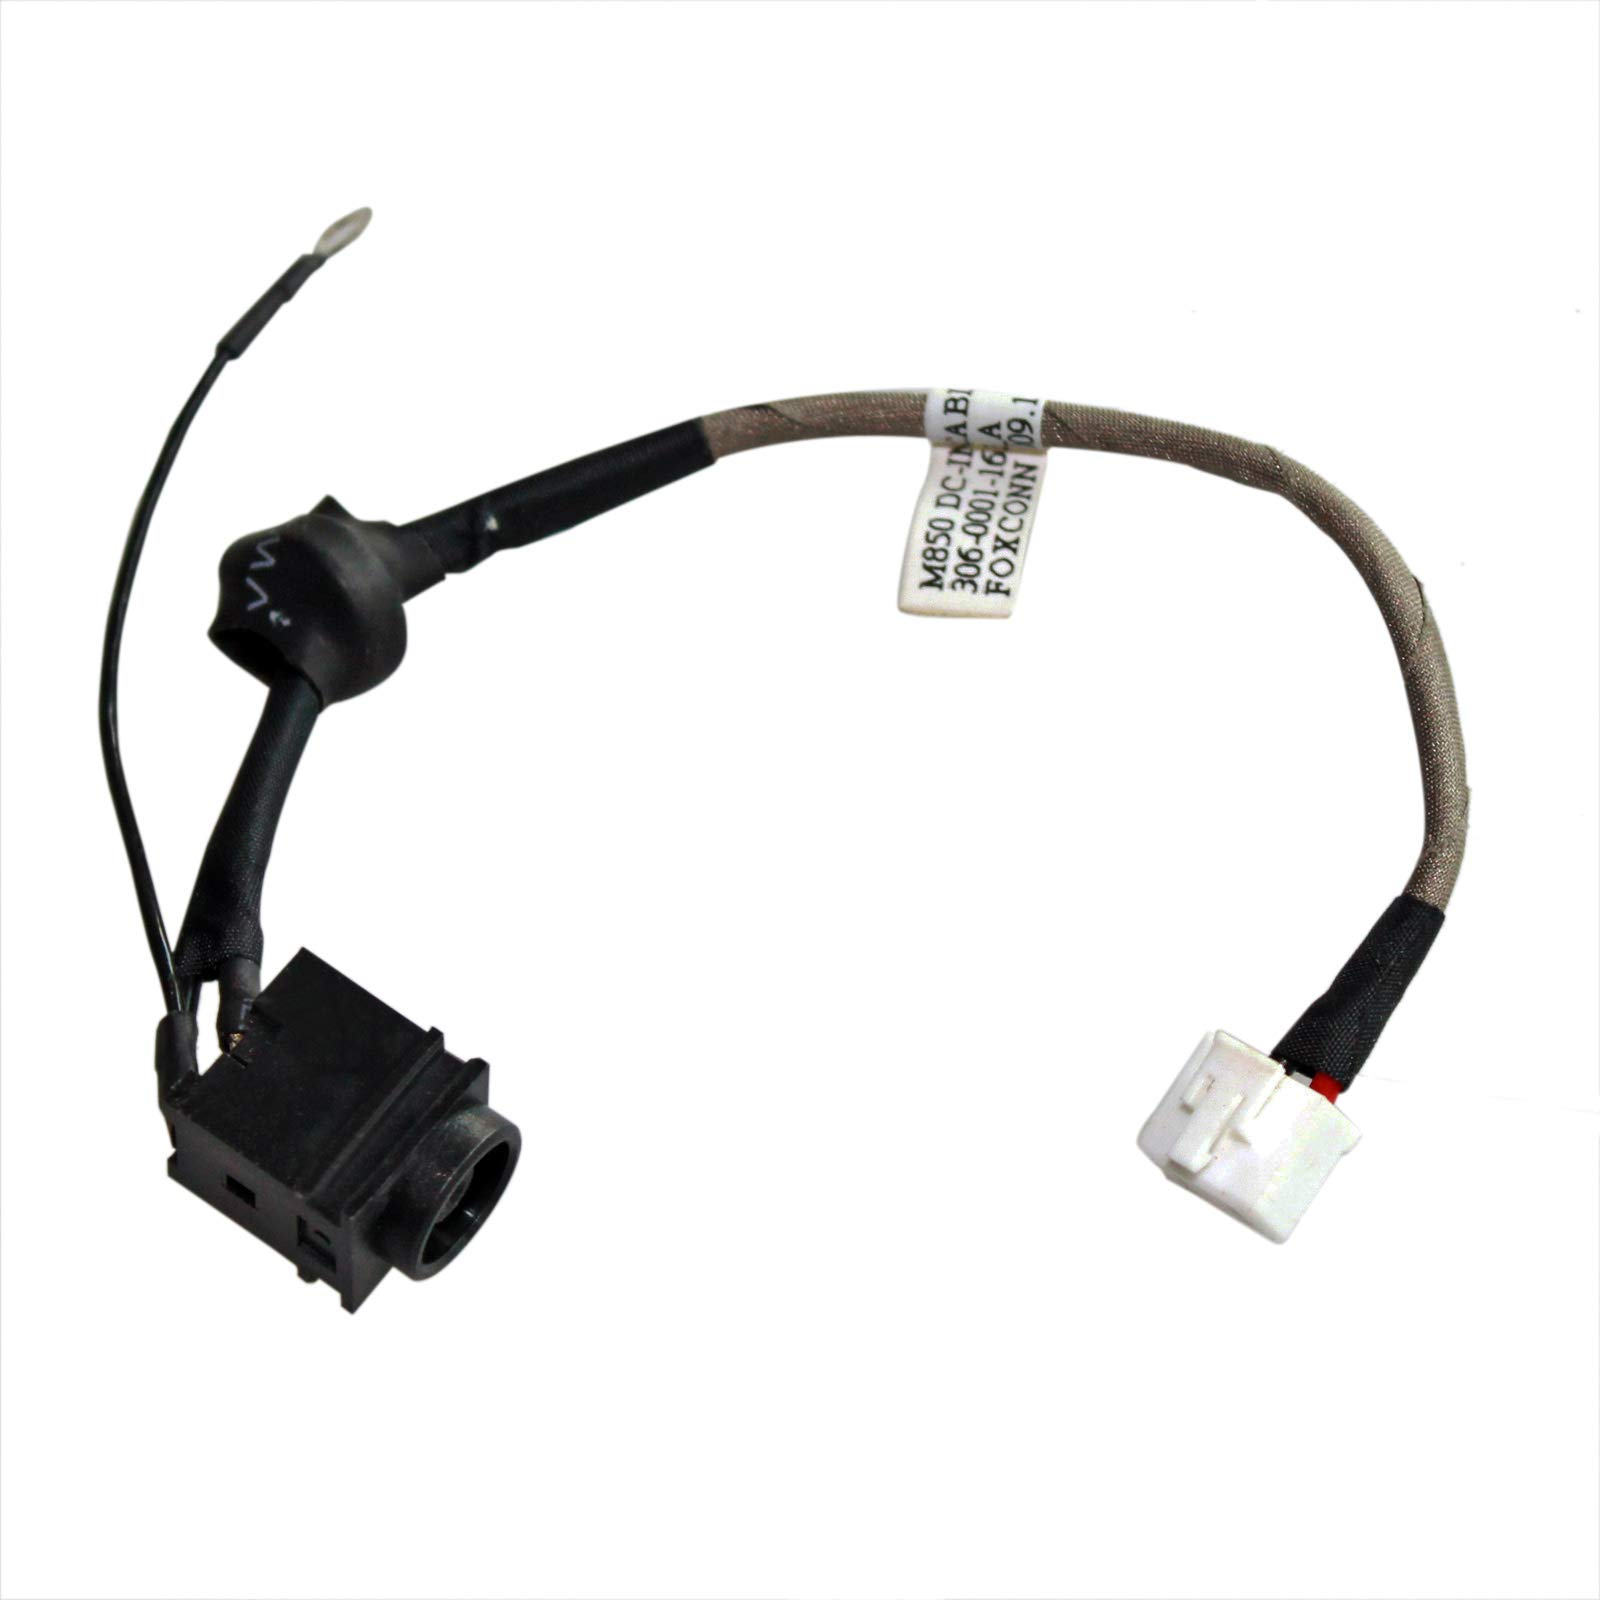 DC Power Jack para Sony VAIO PCG-7182L PCG-7182M PCG-7184L